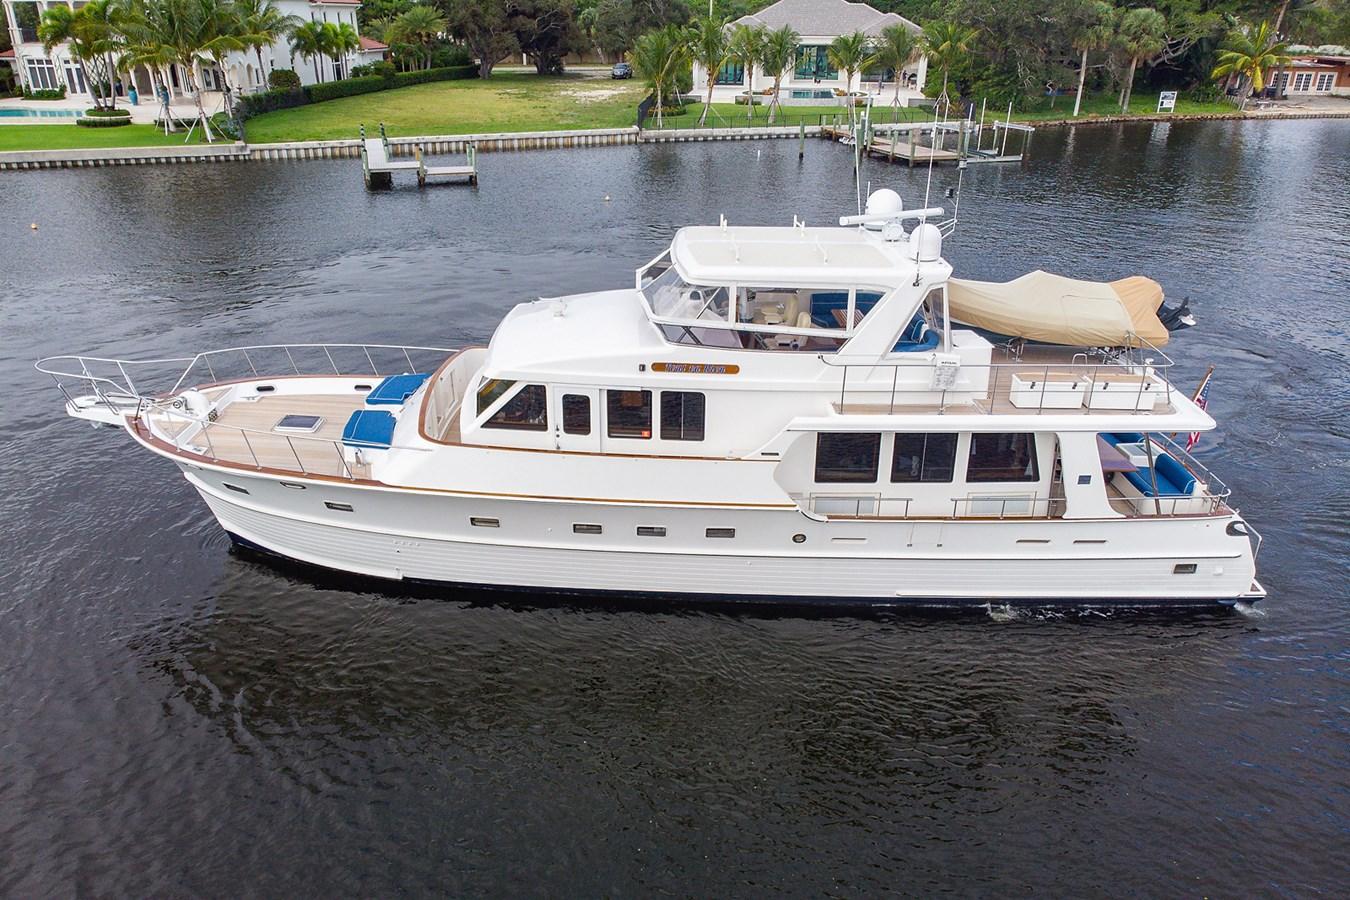 Tout Va BienDJI_0128 2005 GRAND BANKS 64 Aleutian RP Motor Yacht 2726186